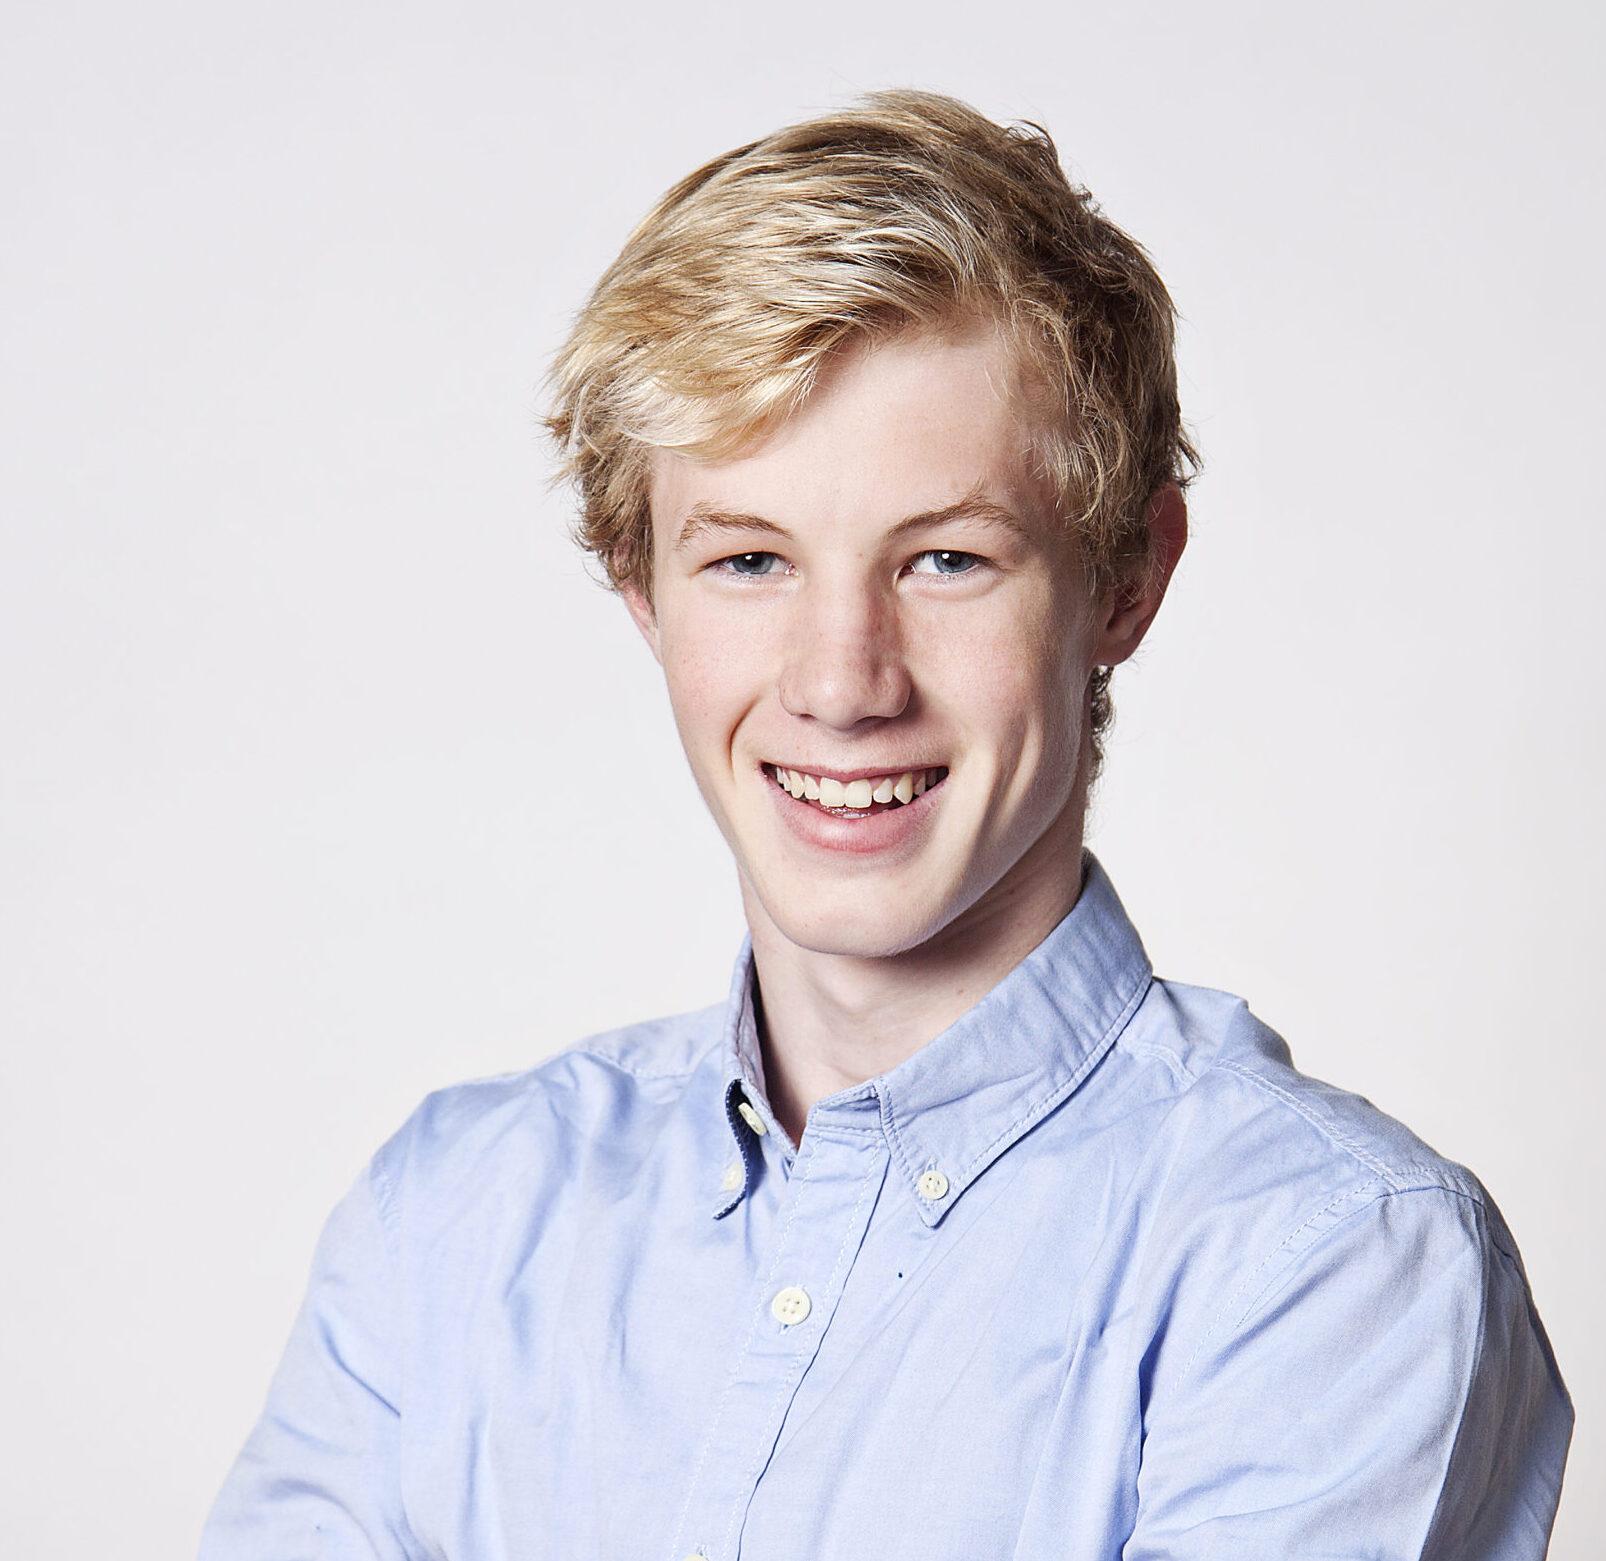 Daniel Johannesen